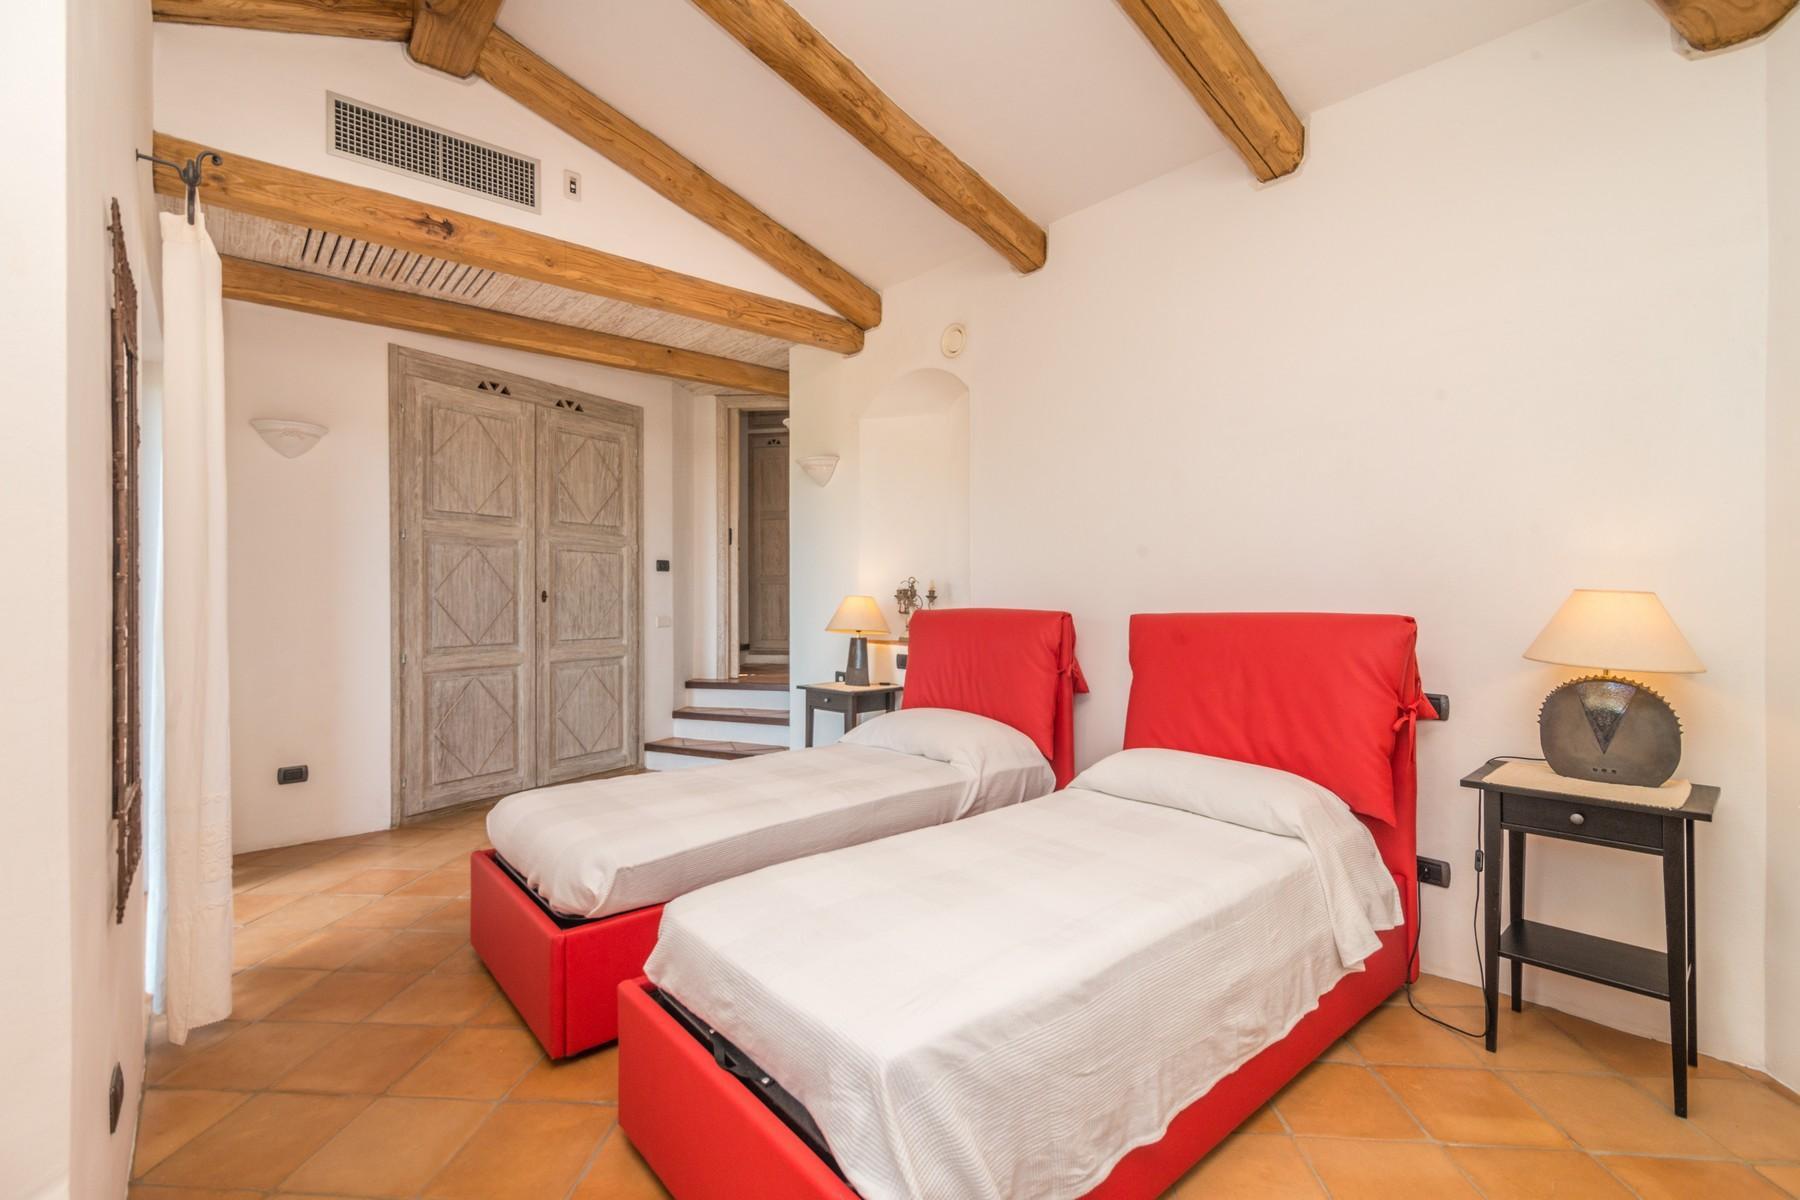 Porto Cervo Abbiadori Splendide villa jumelée avec vue sur le golfe de Pevero - 25